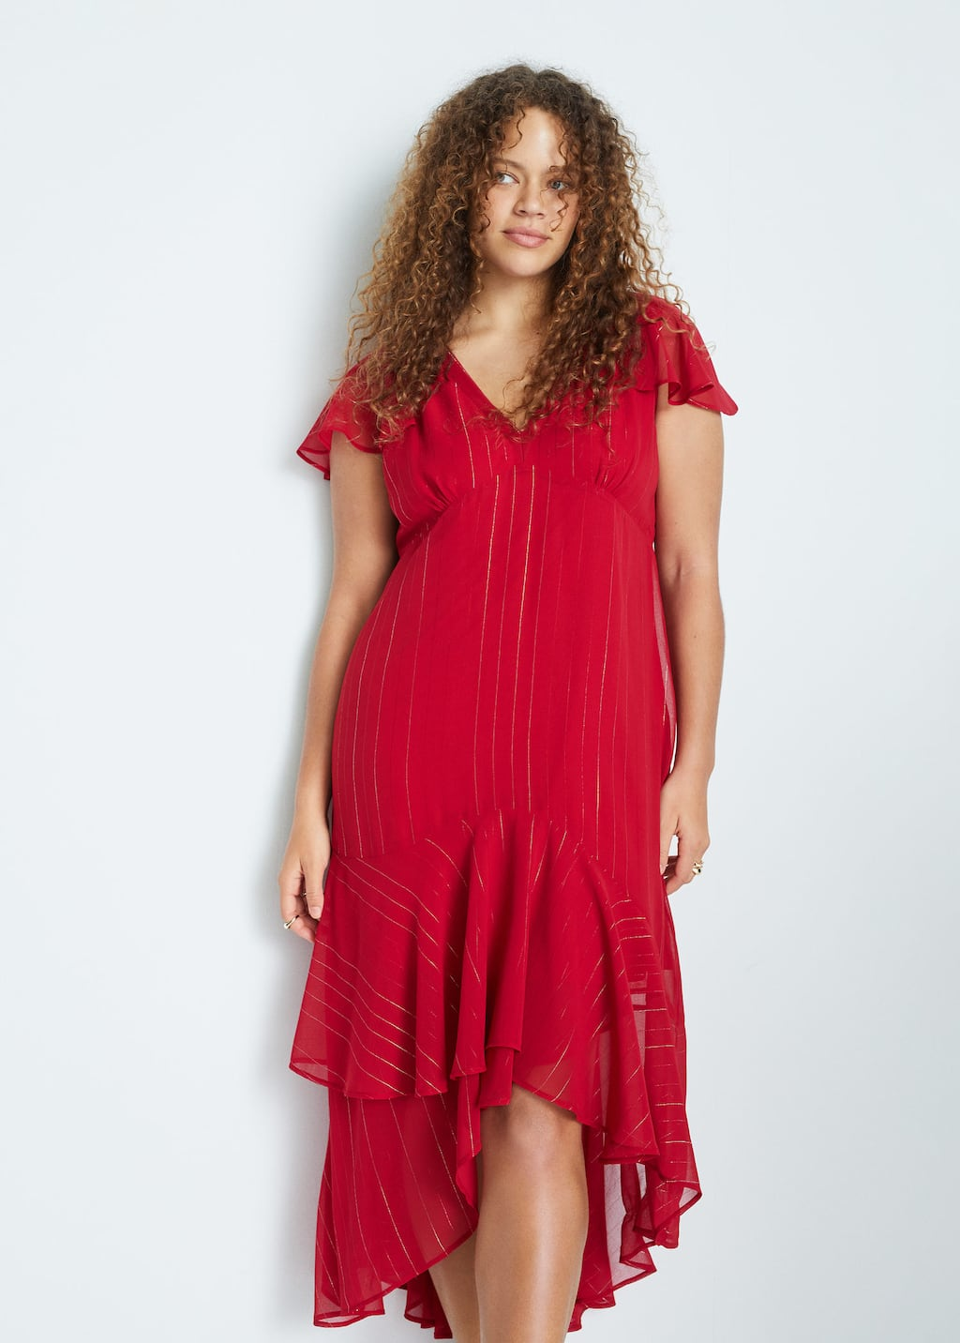 ruffled midi dress - plus sizes | violetamango singapore